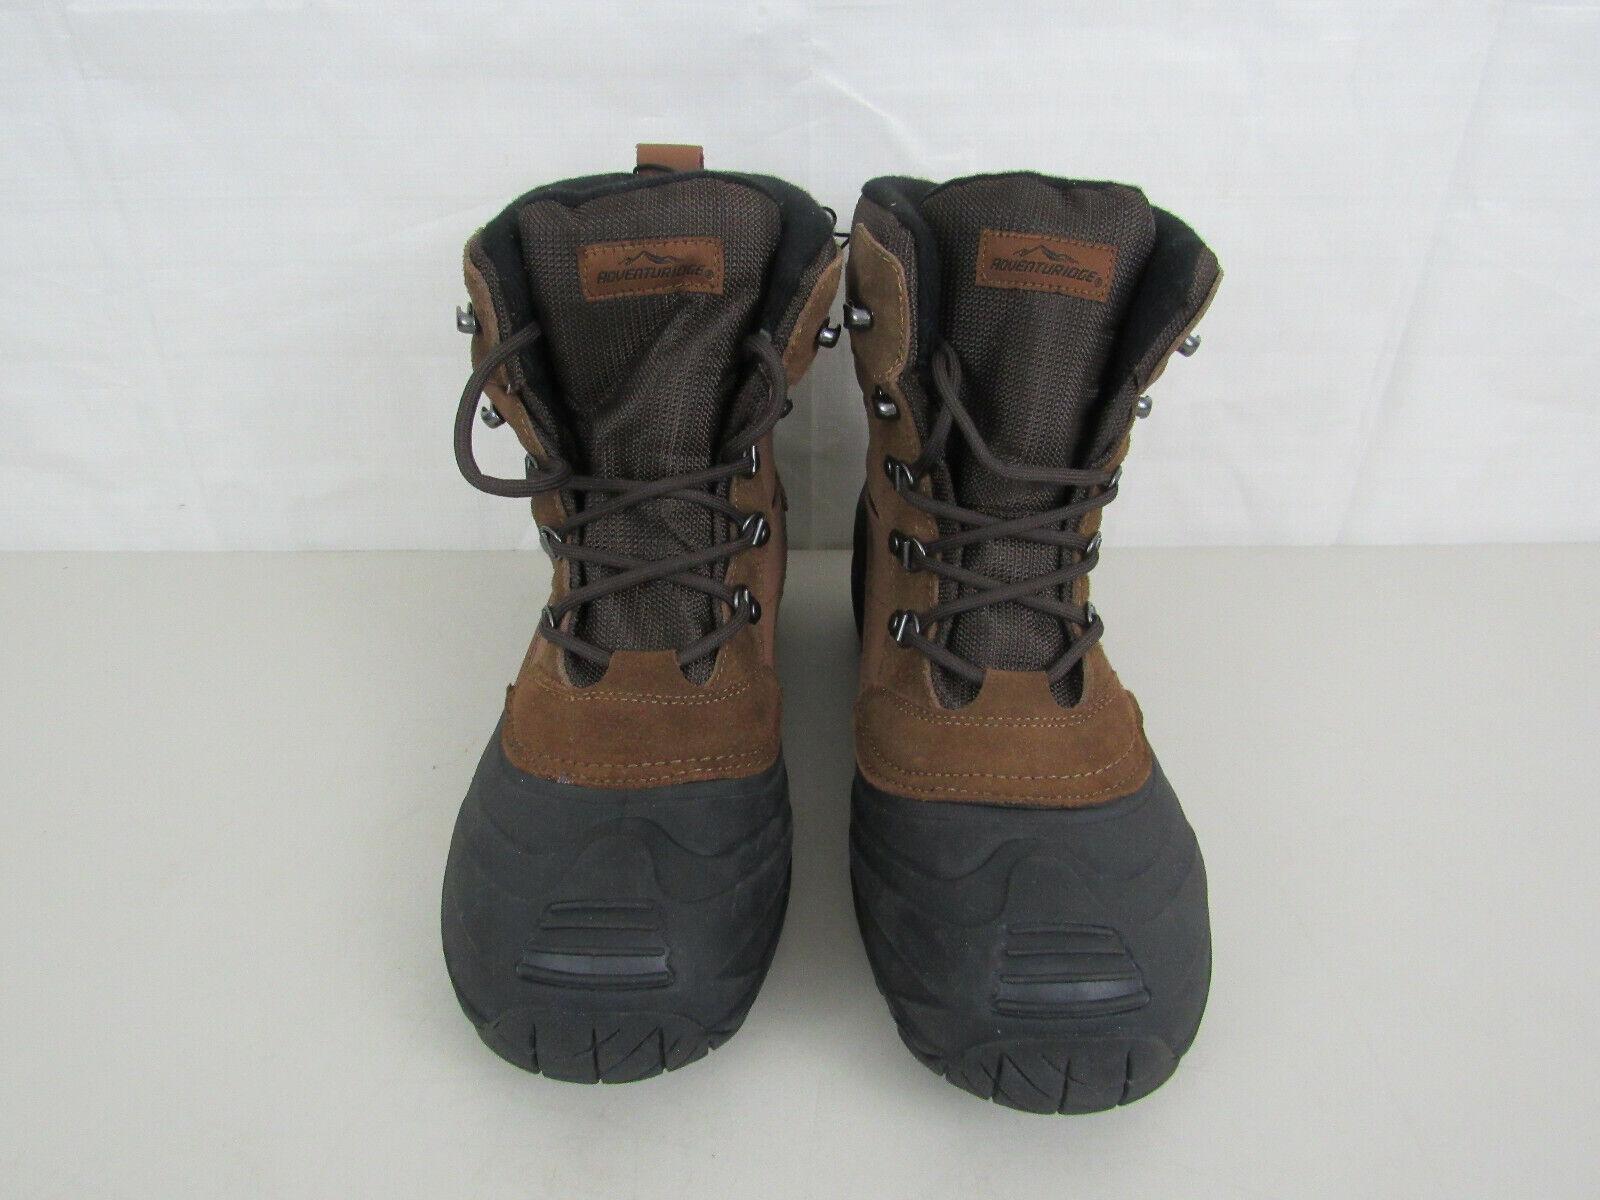 Adventuridge Mens Winter Boots ALDI US-57189 Size 11-New